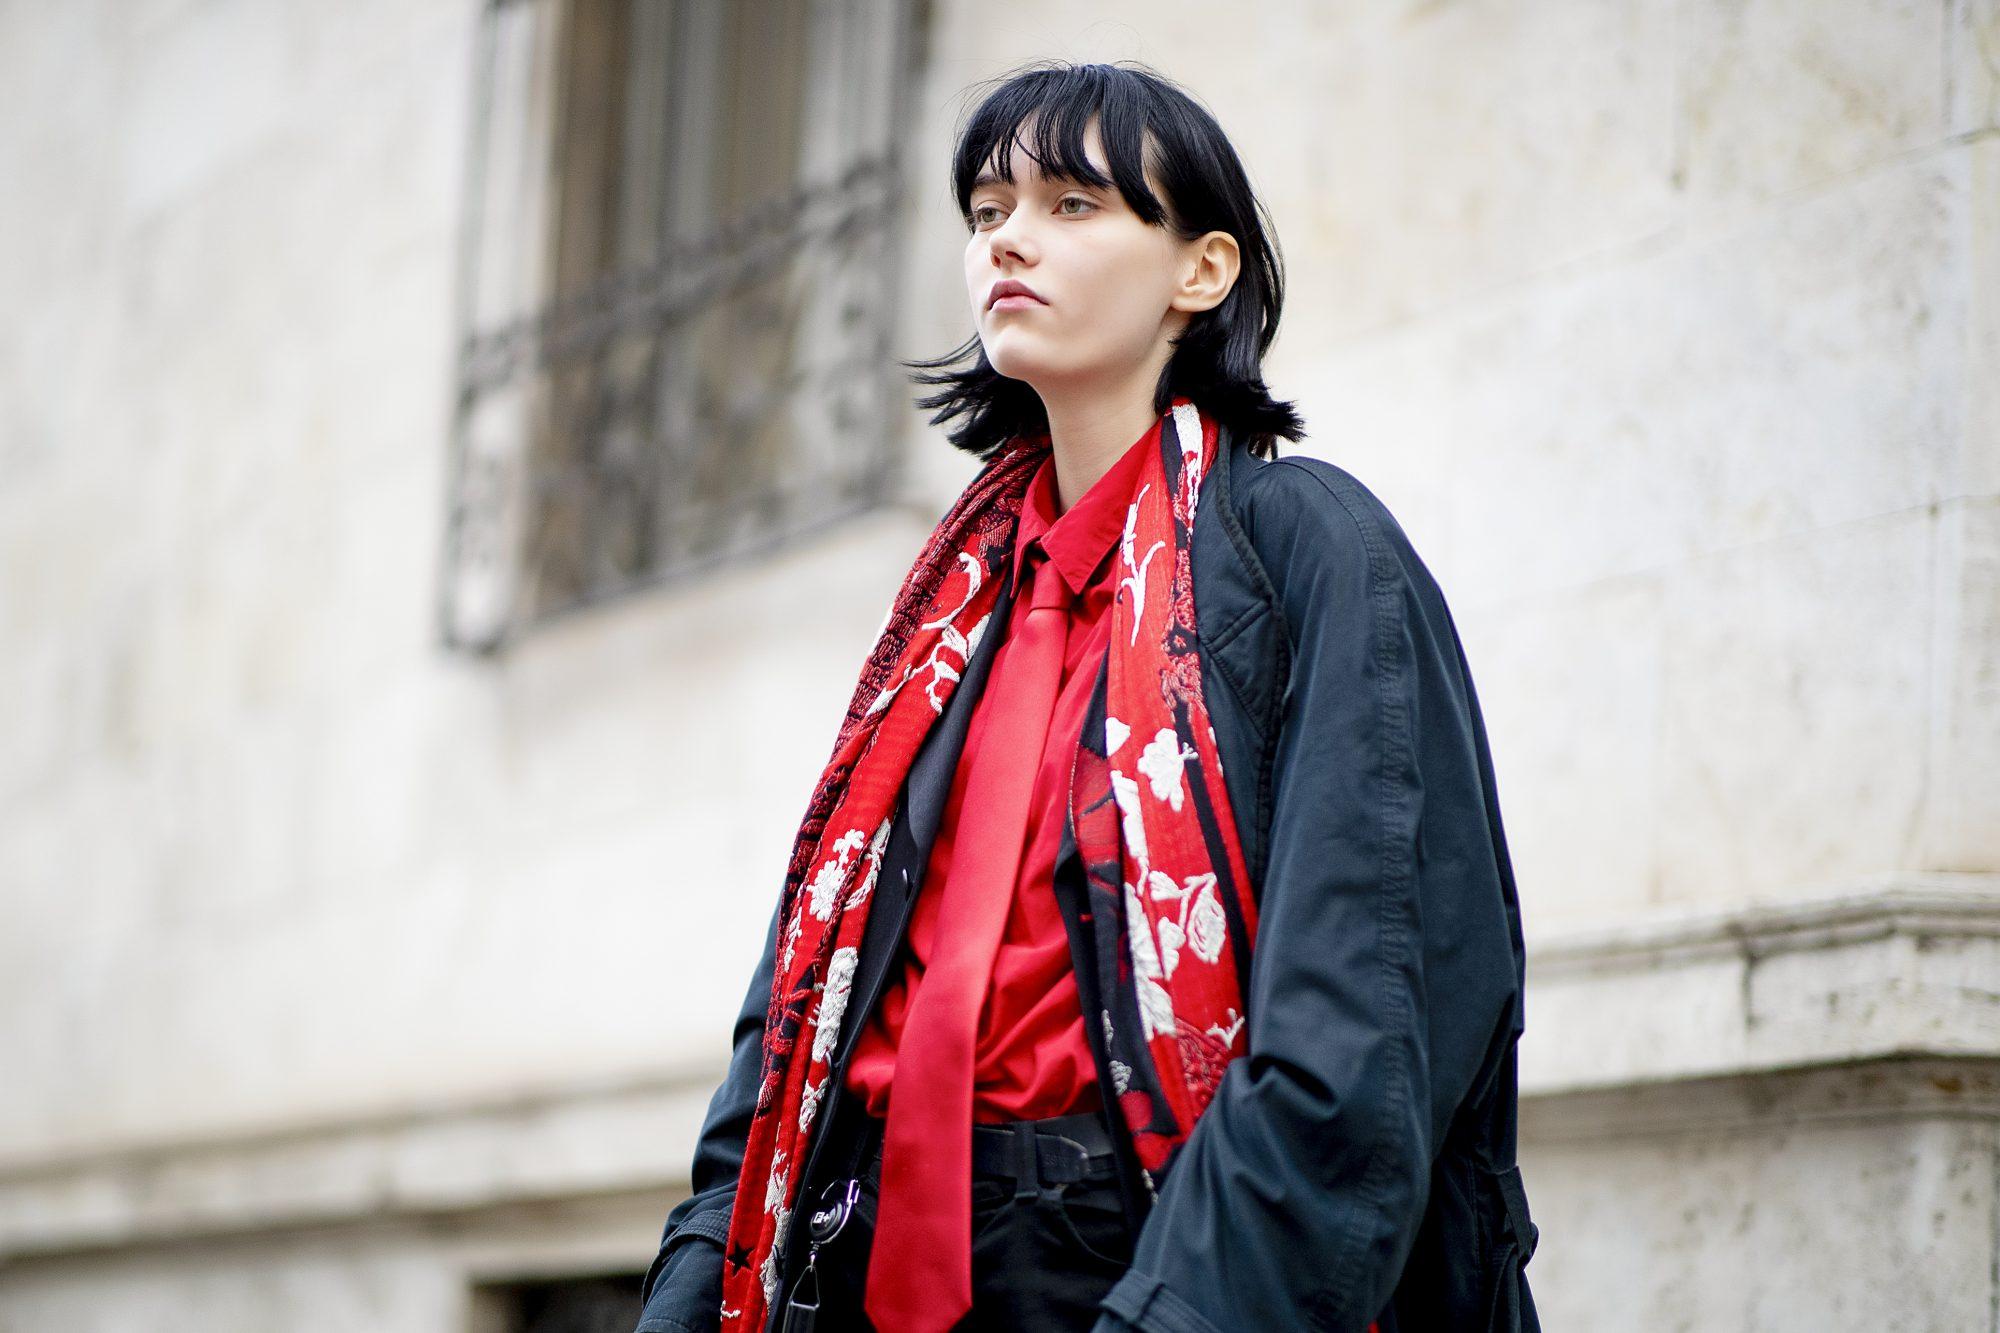 Milan Fashion Week: Οι street style εμφανίσεις ήταν λίγες αλλά καλές (και θα τις αντιγράψουμε όλες!)